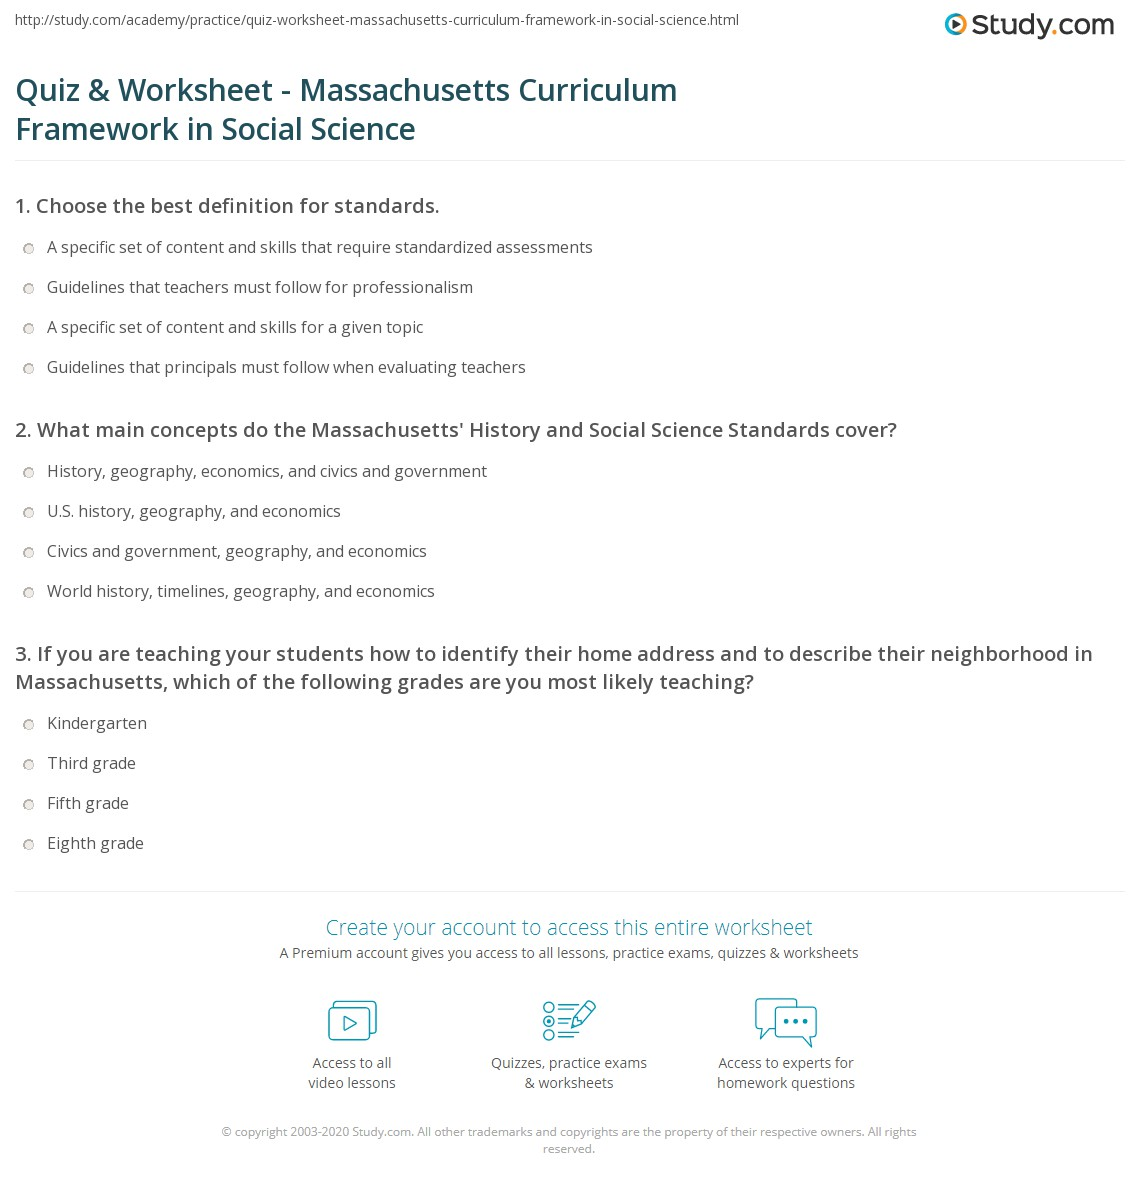 hight resolution of Quiz \u0026 Worksheet - Massachusetts Curriculum Framework in Social Science    Study.com